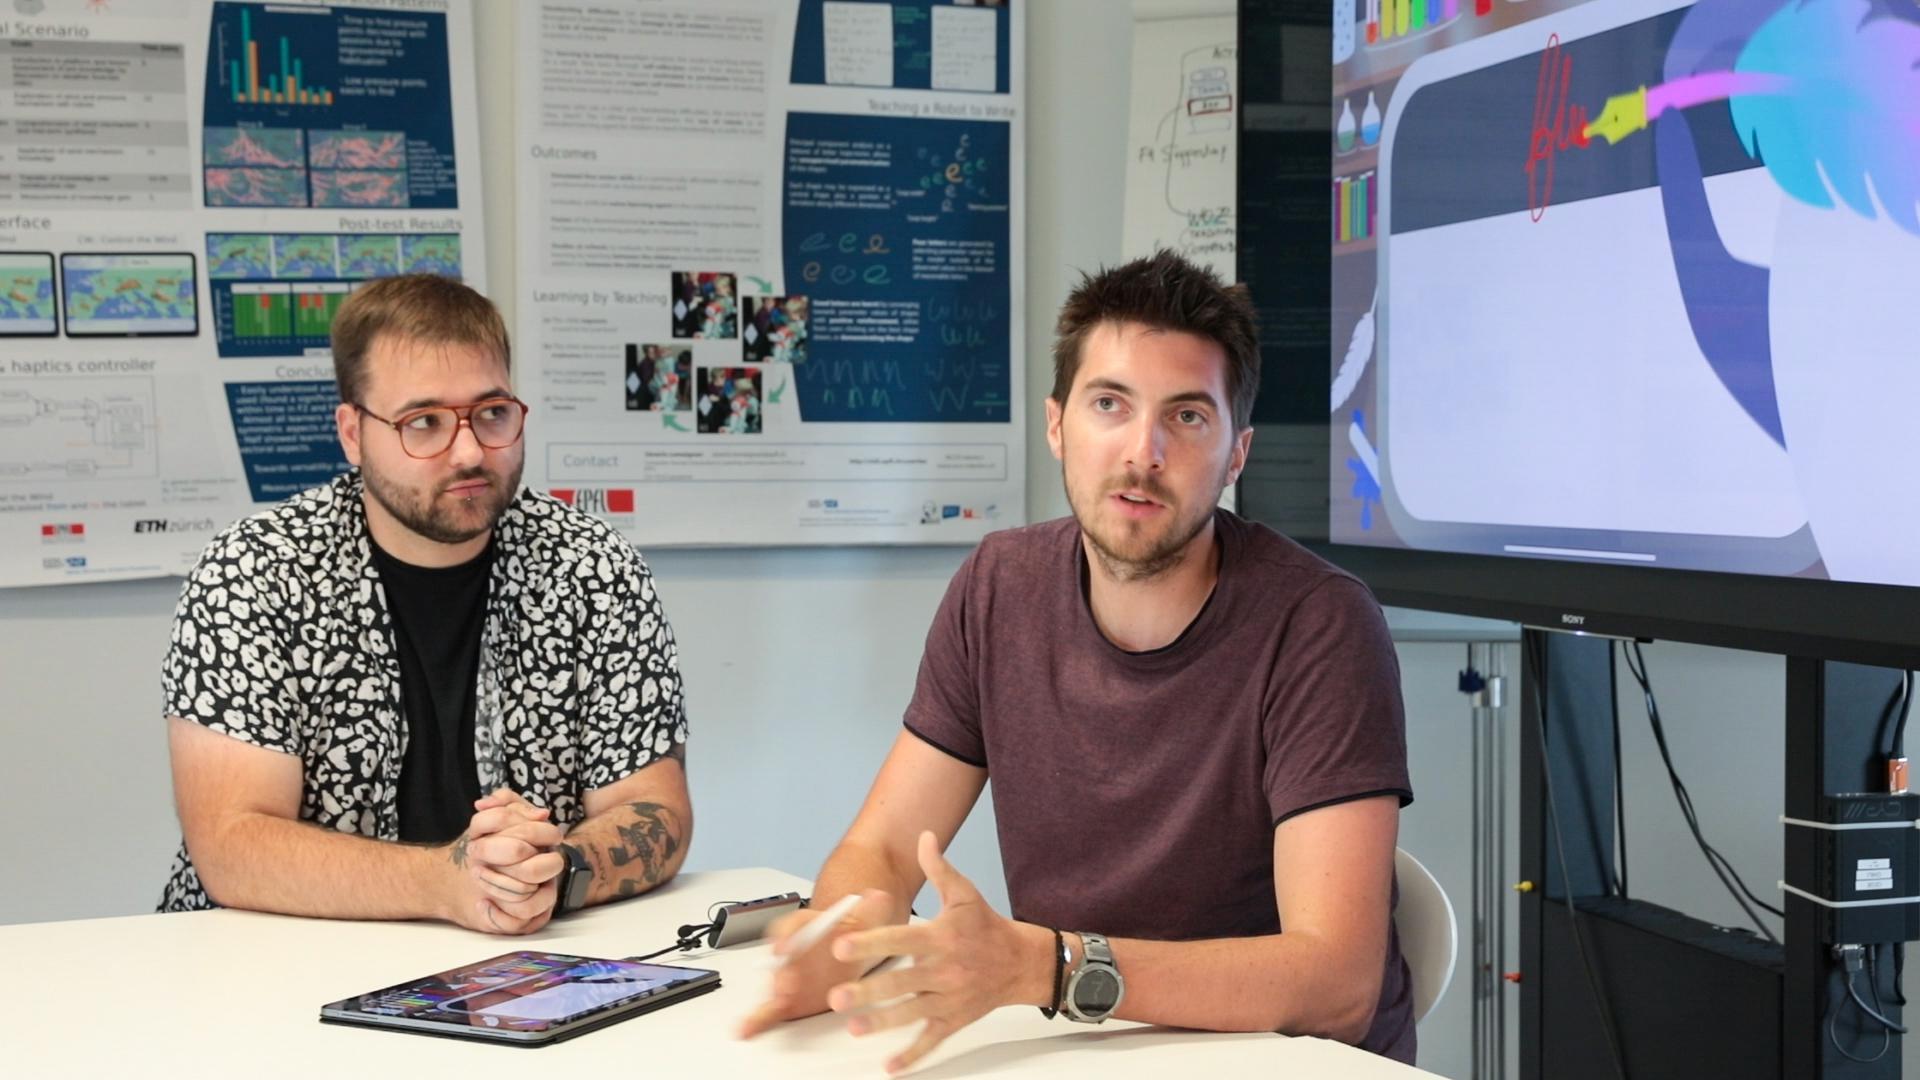 Sven Viquerat, designer, and Thibault Asselborn, CEO of School Rebound © 2021 Alain Herzog